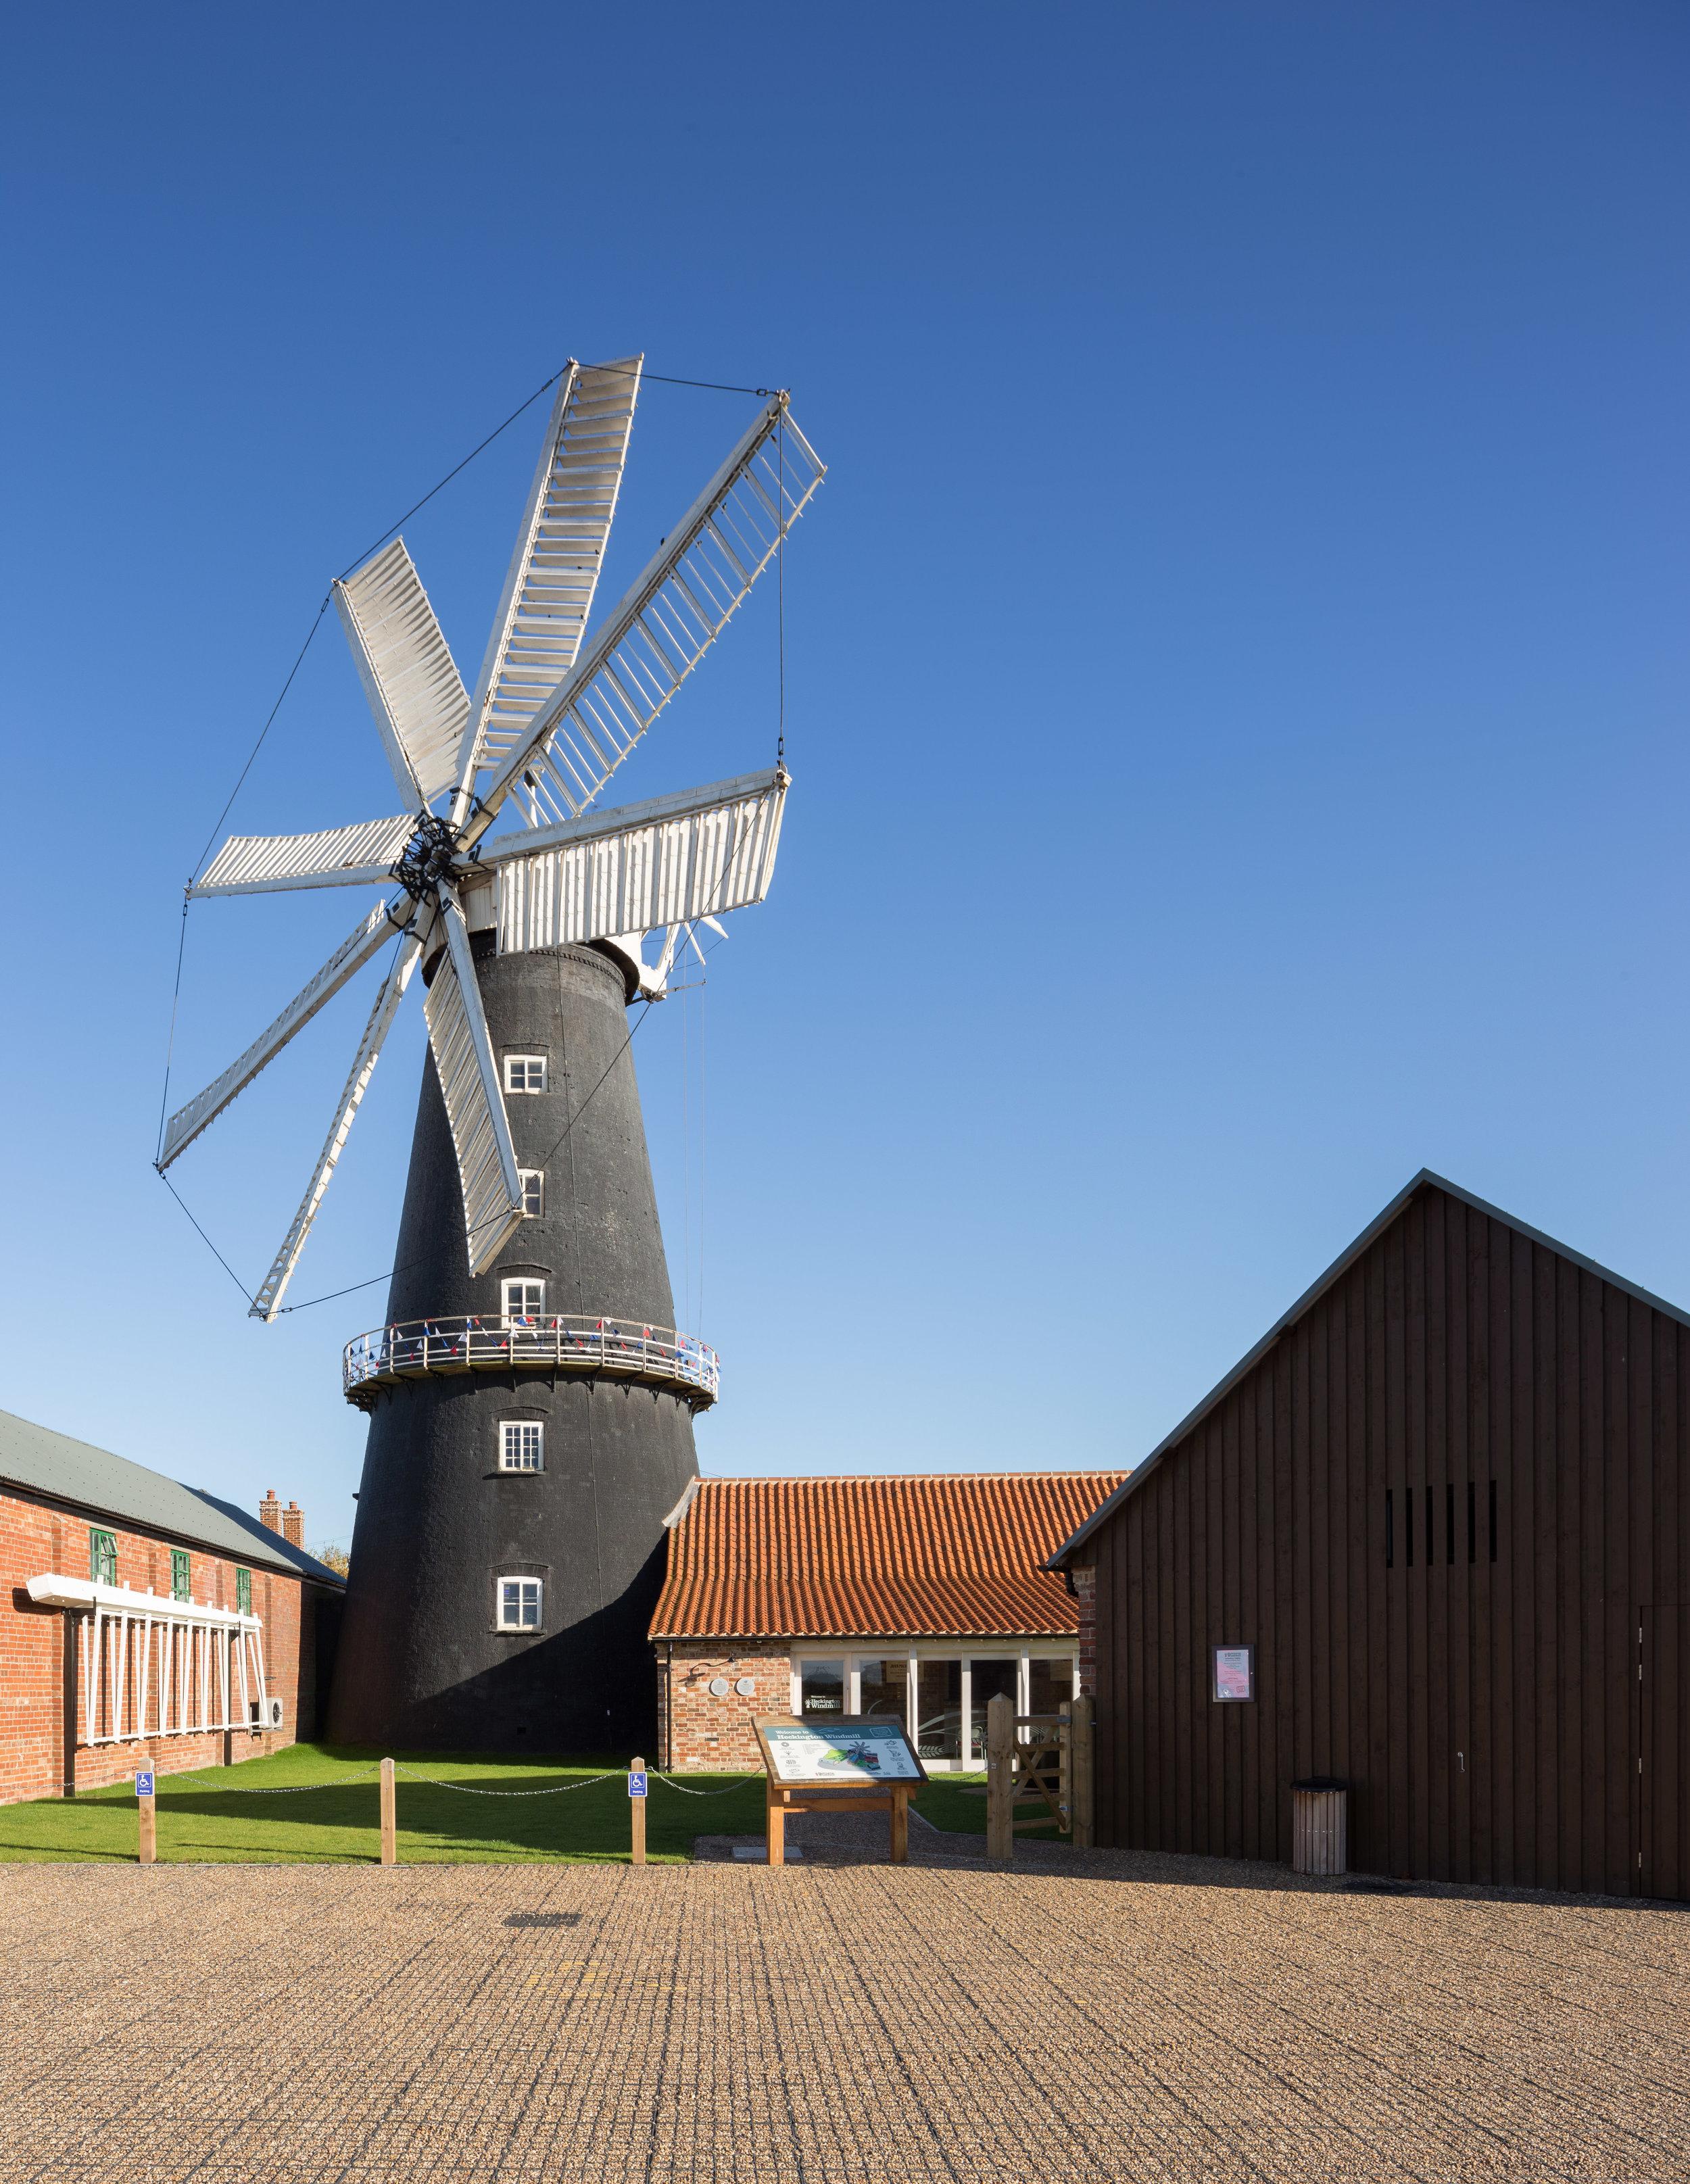 CGA_Heckington Windmill_IMG_8539-HDR-Pano.jpg